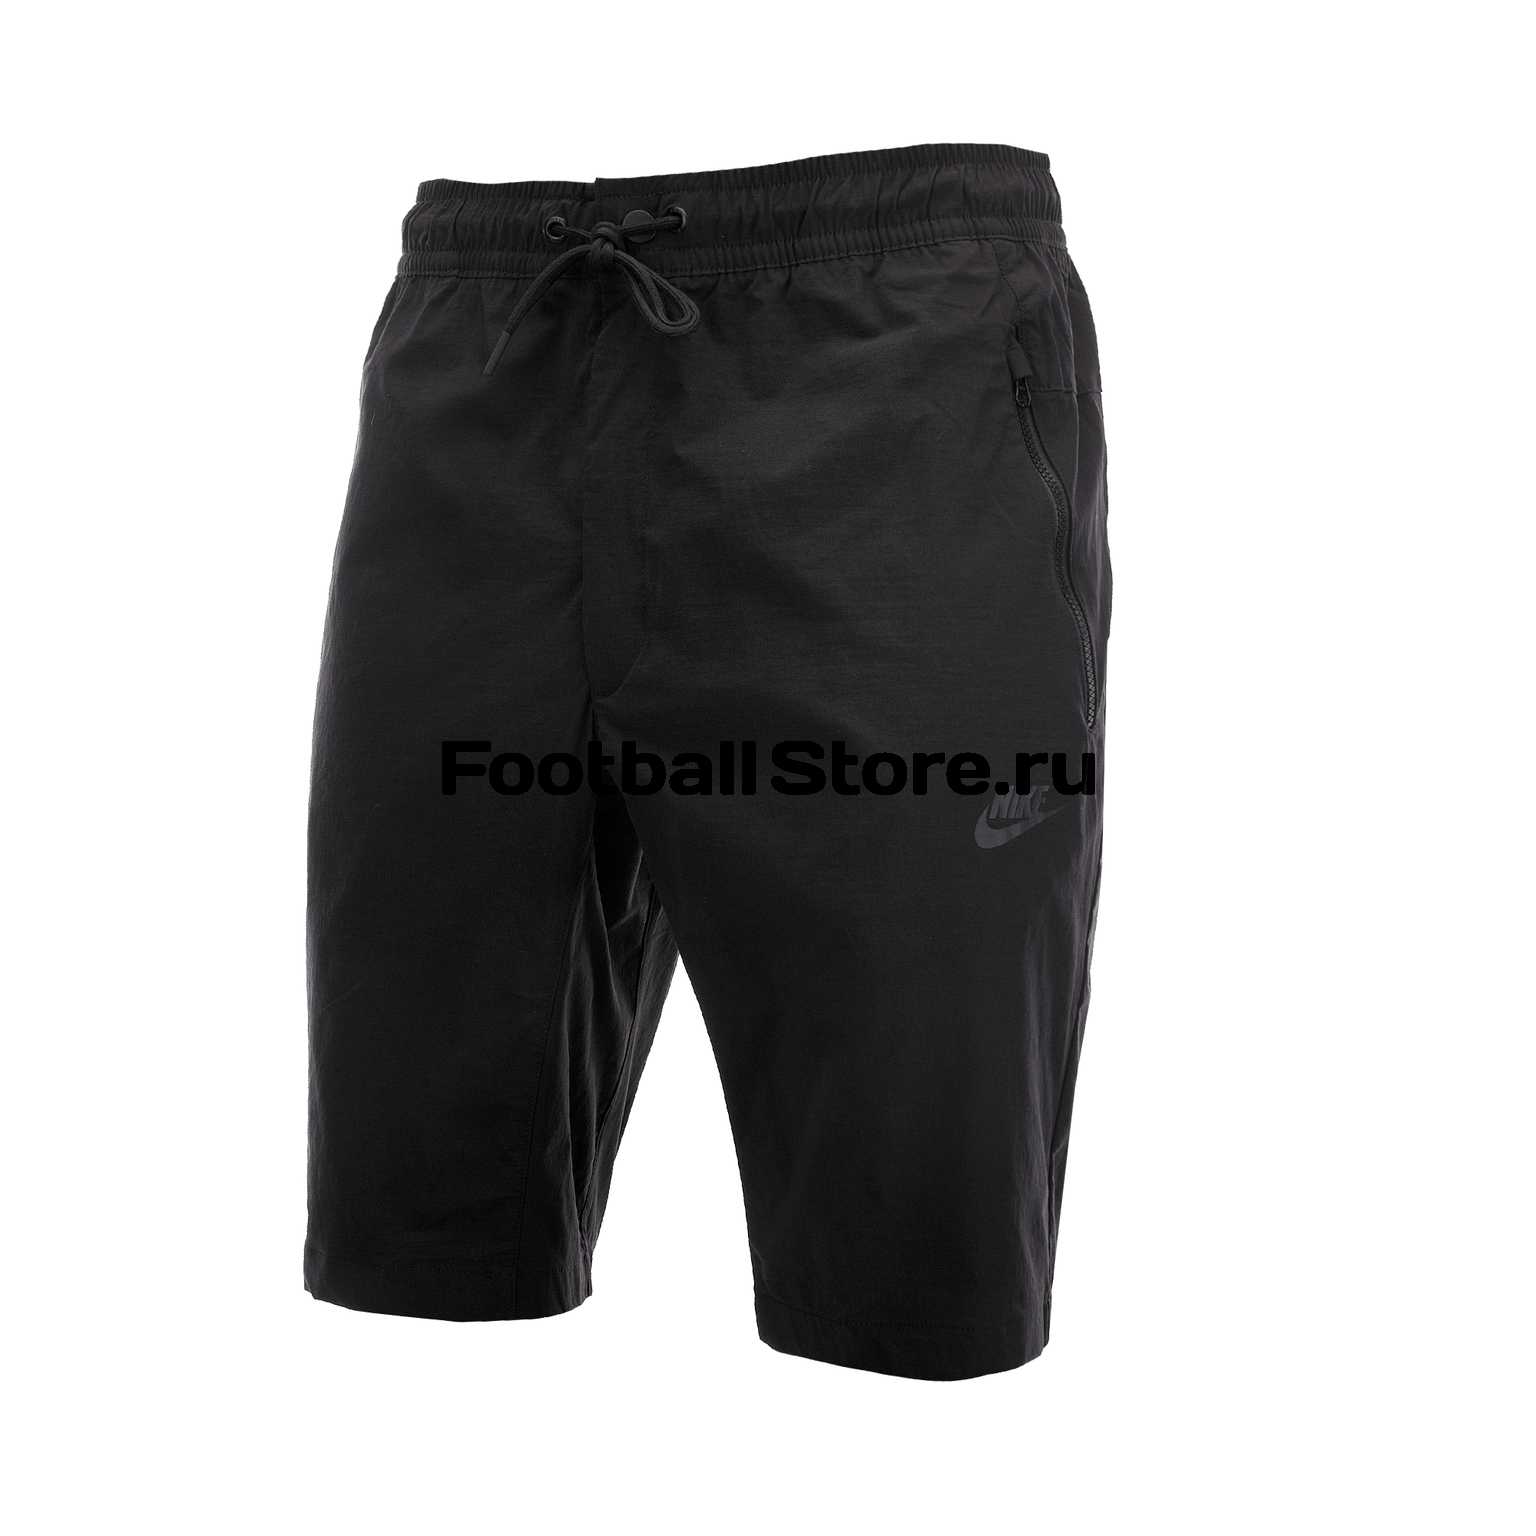 Шорты Nike Woven Short 927920-010